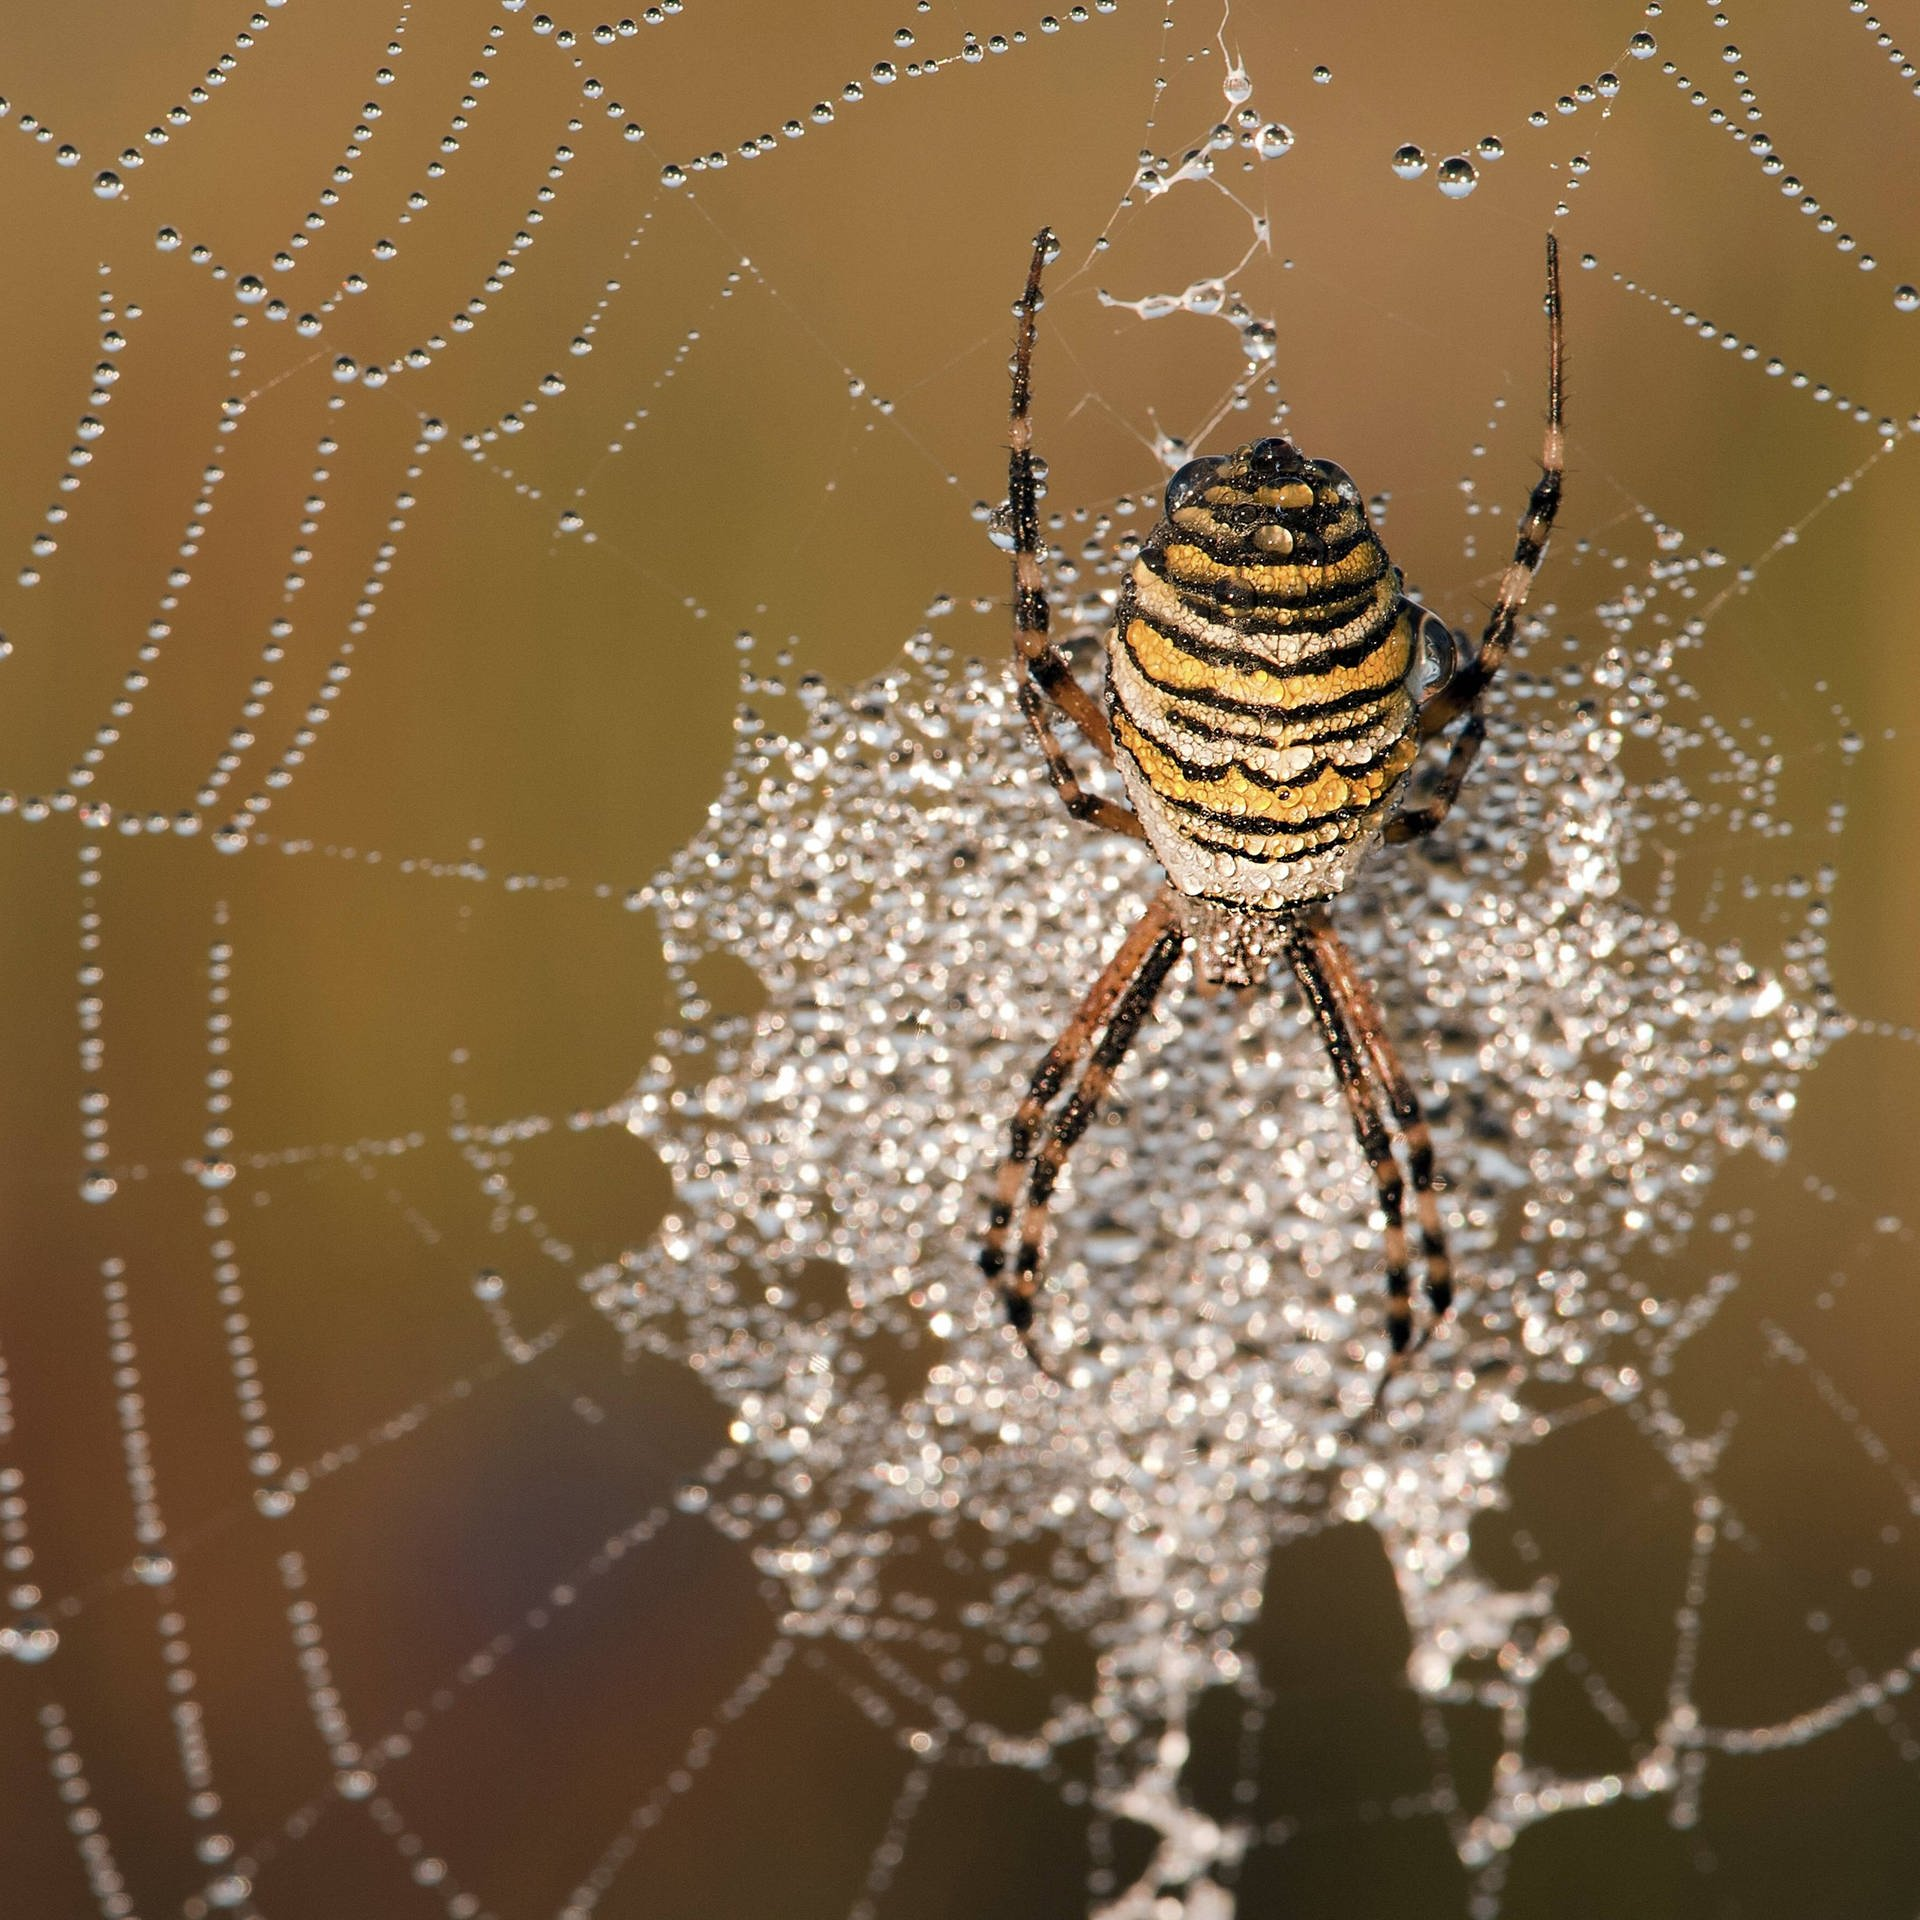 Herz aus Spinnenseide – Medizinischer Fortschritt am Faden